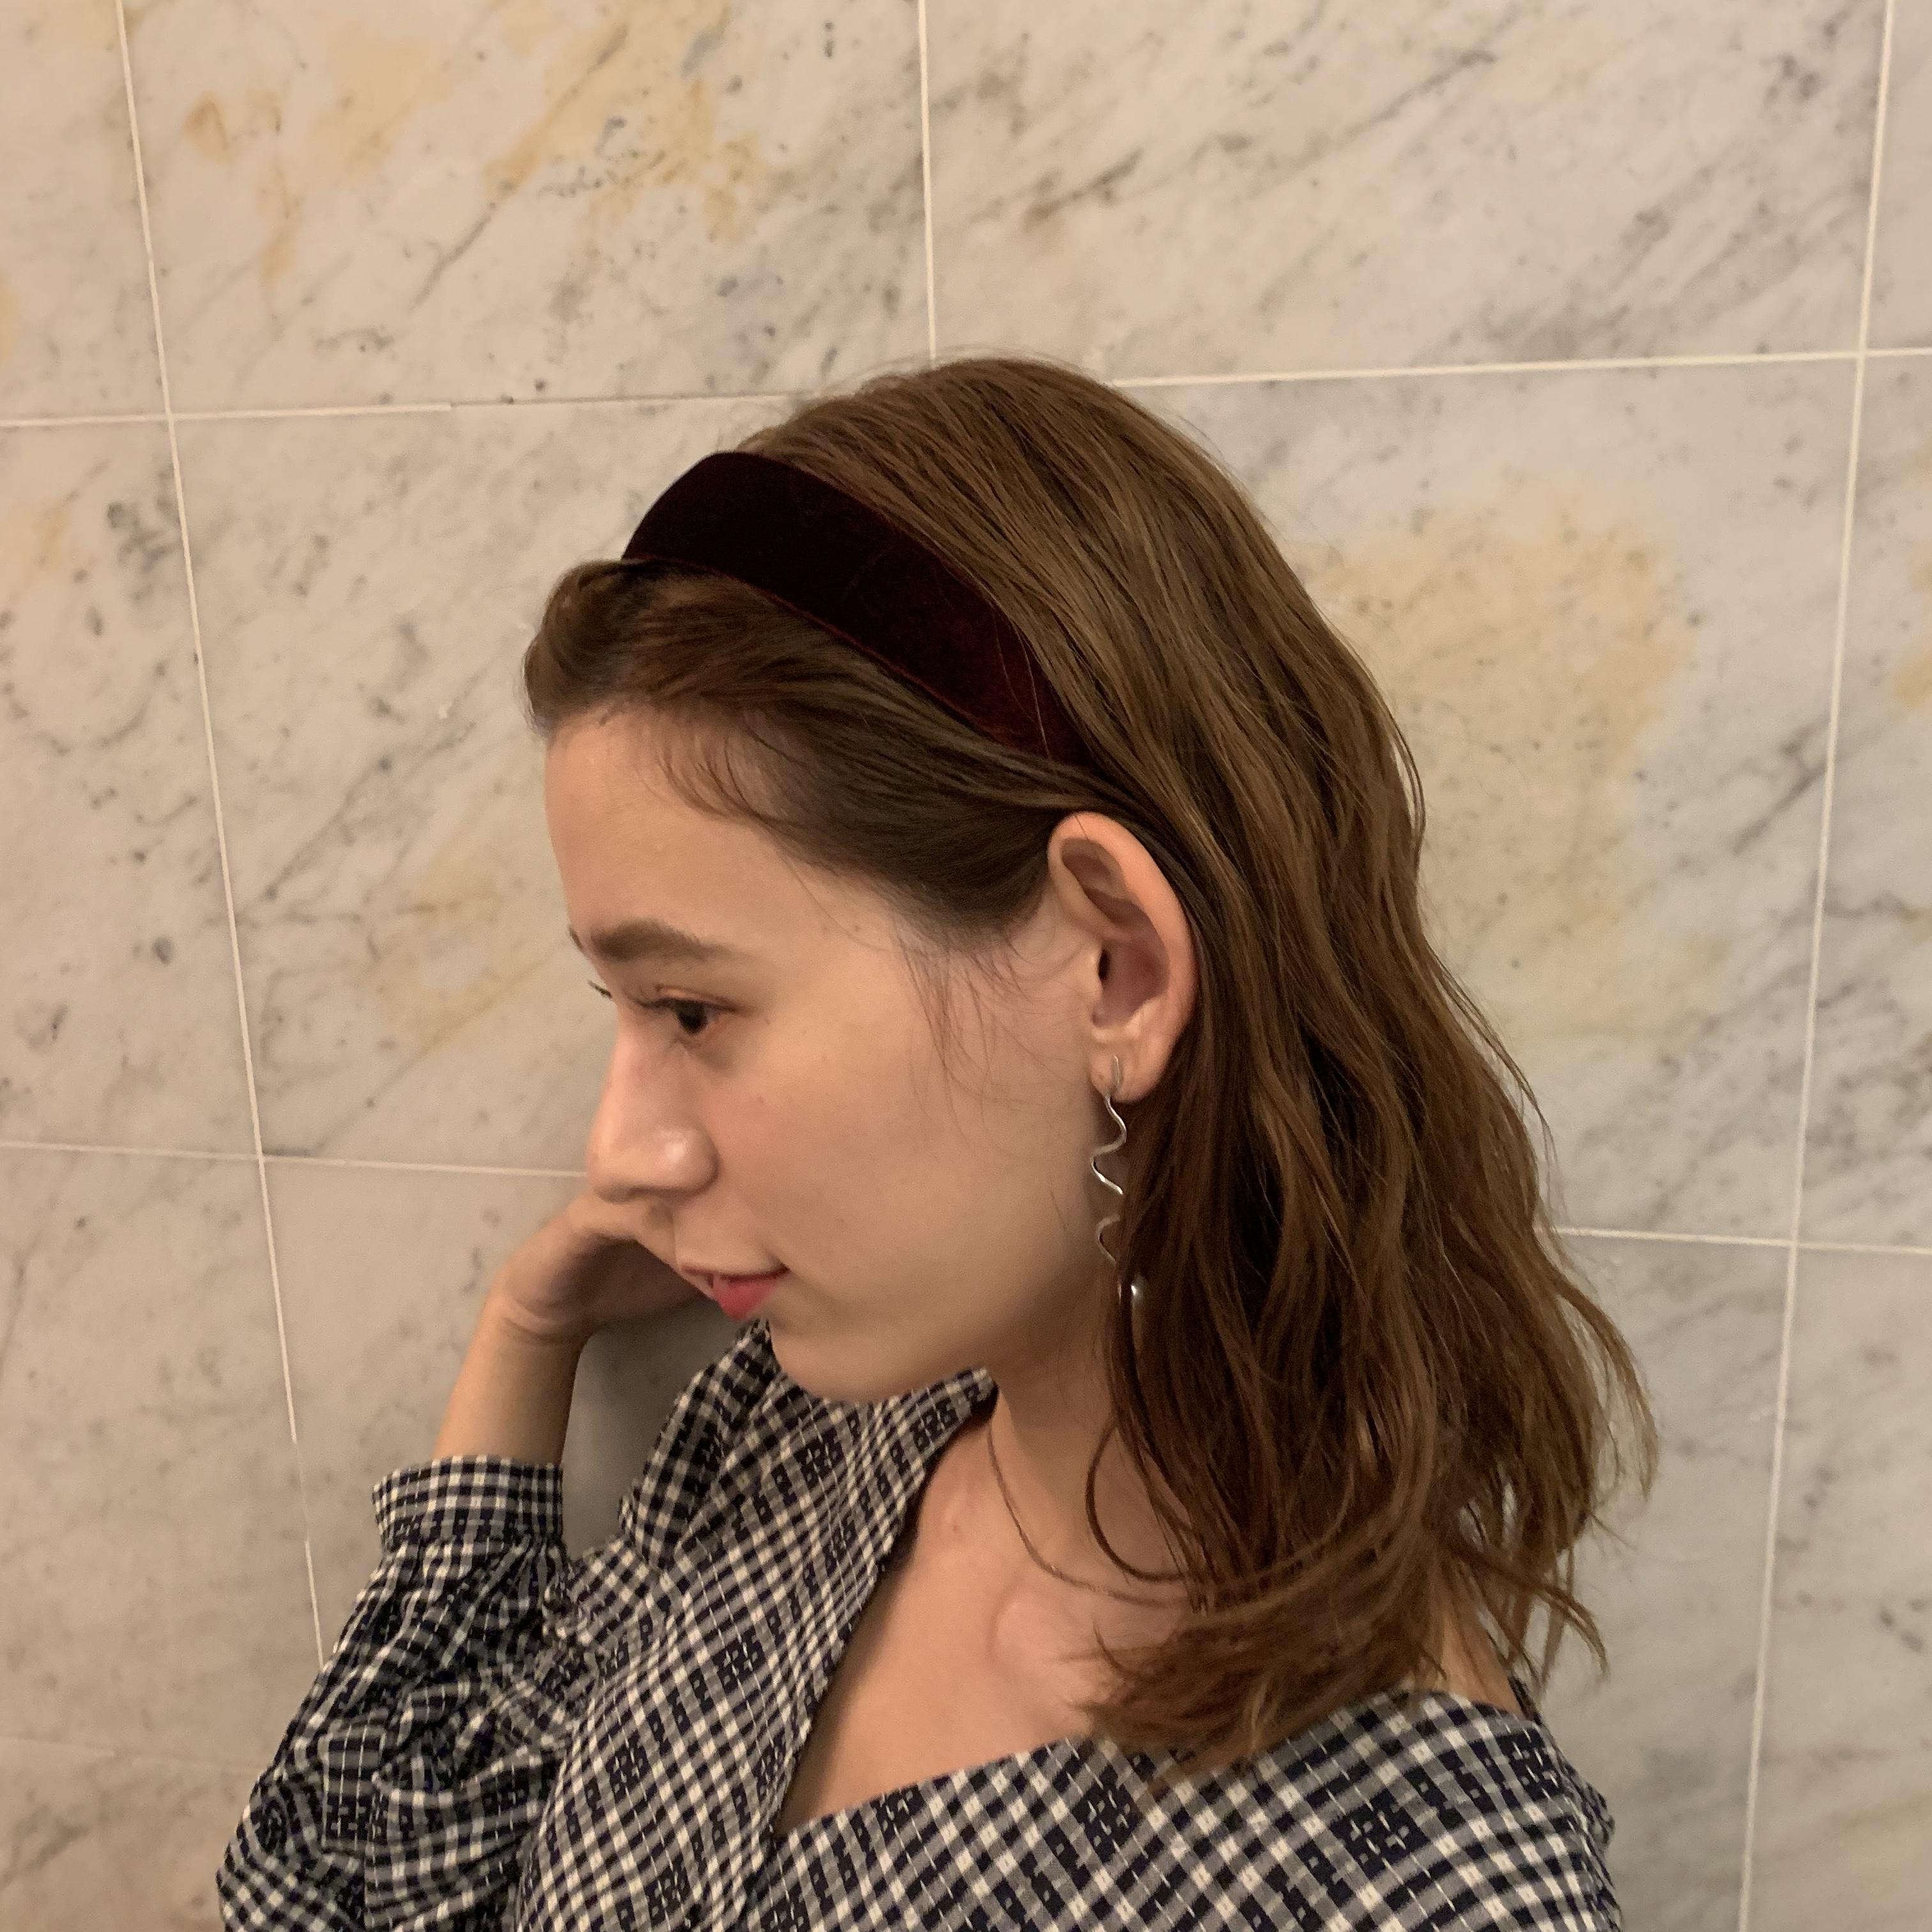 beroa hair accessory[typeA]